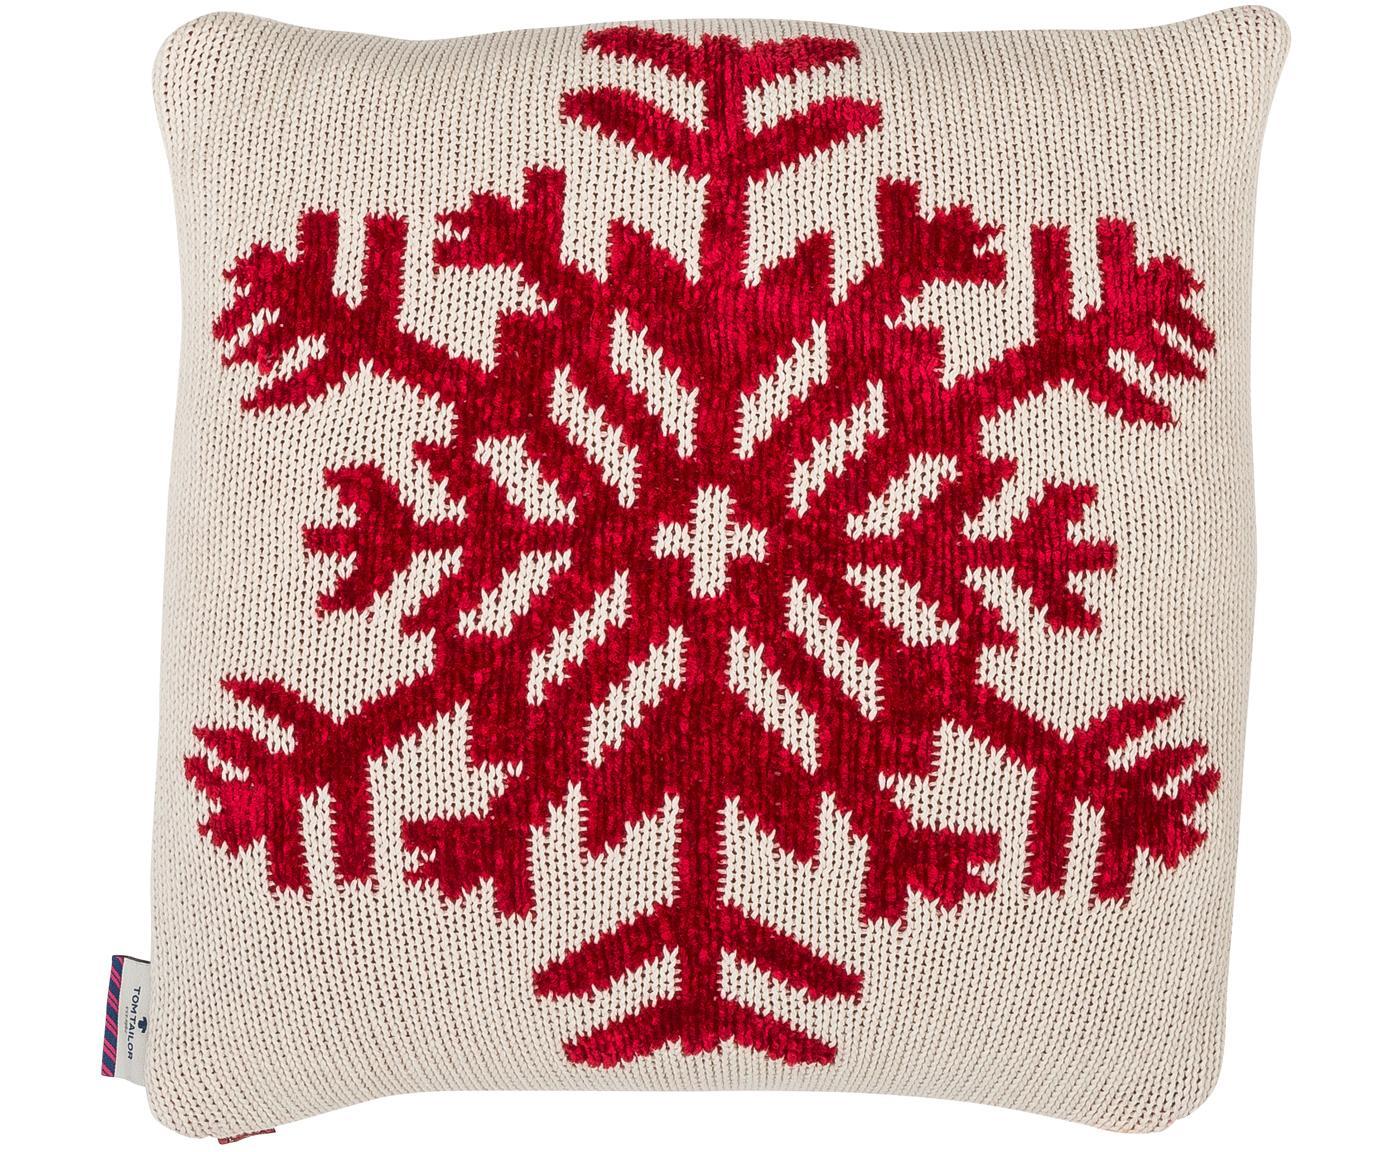 Gebreide kussenhoes Snowflake, Katoen, Wit, rood, 40 x 40 cm